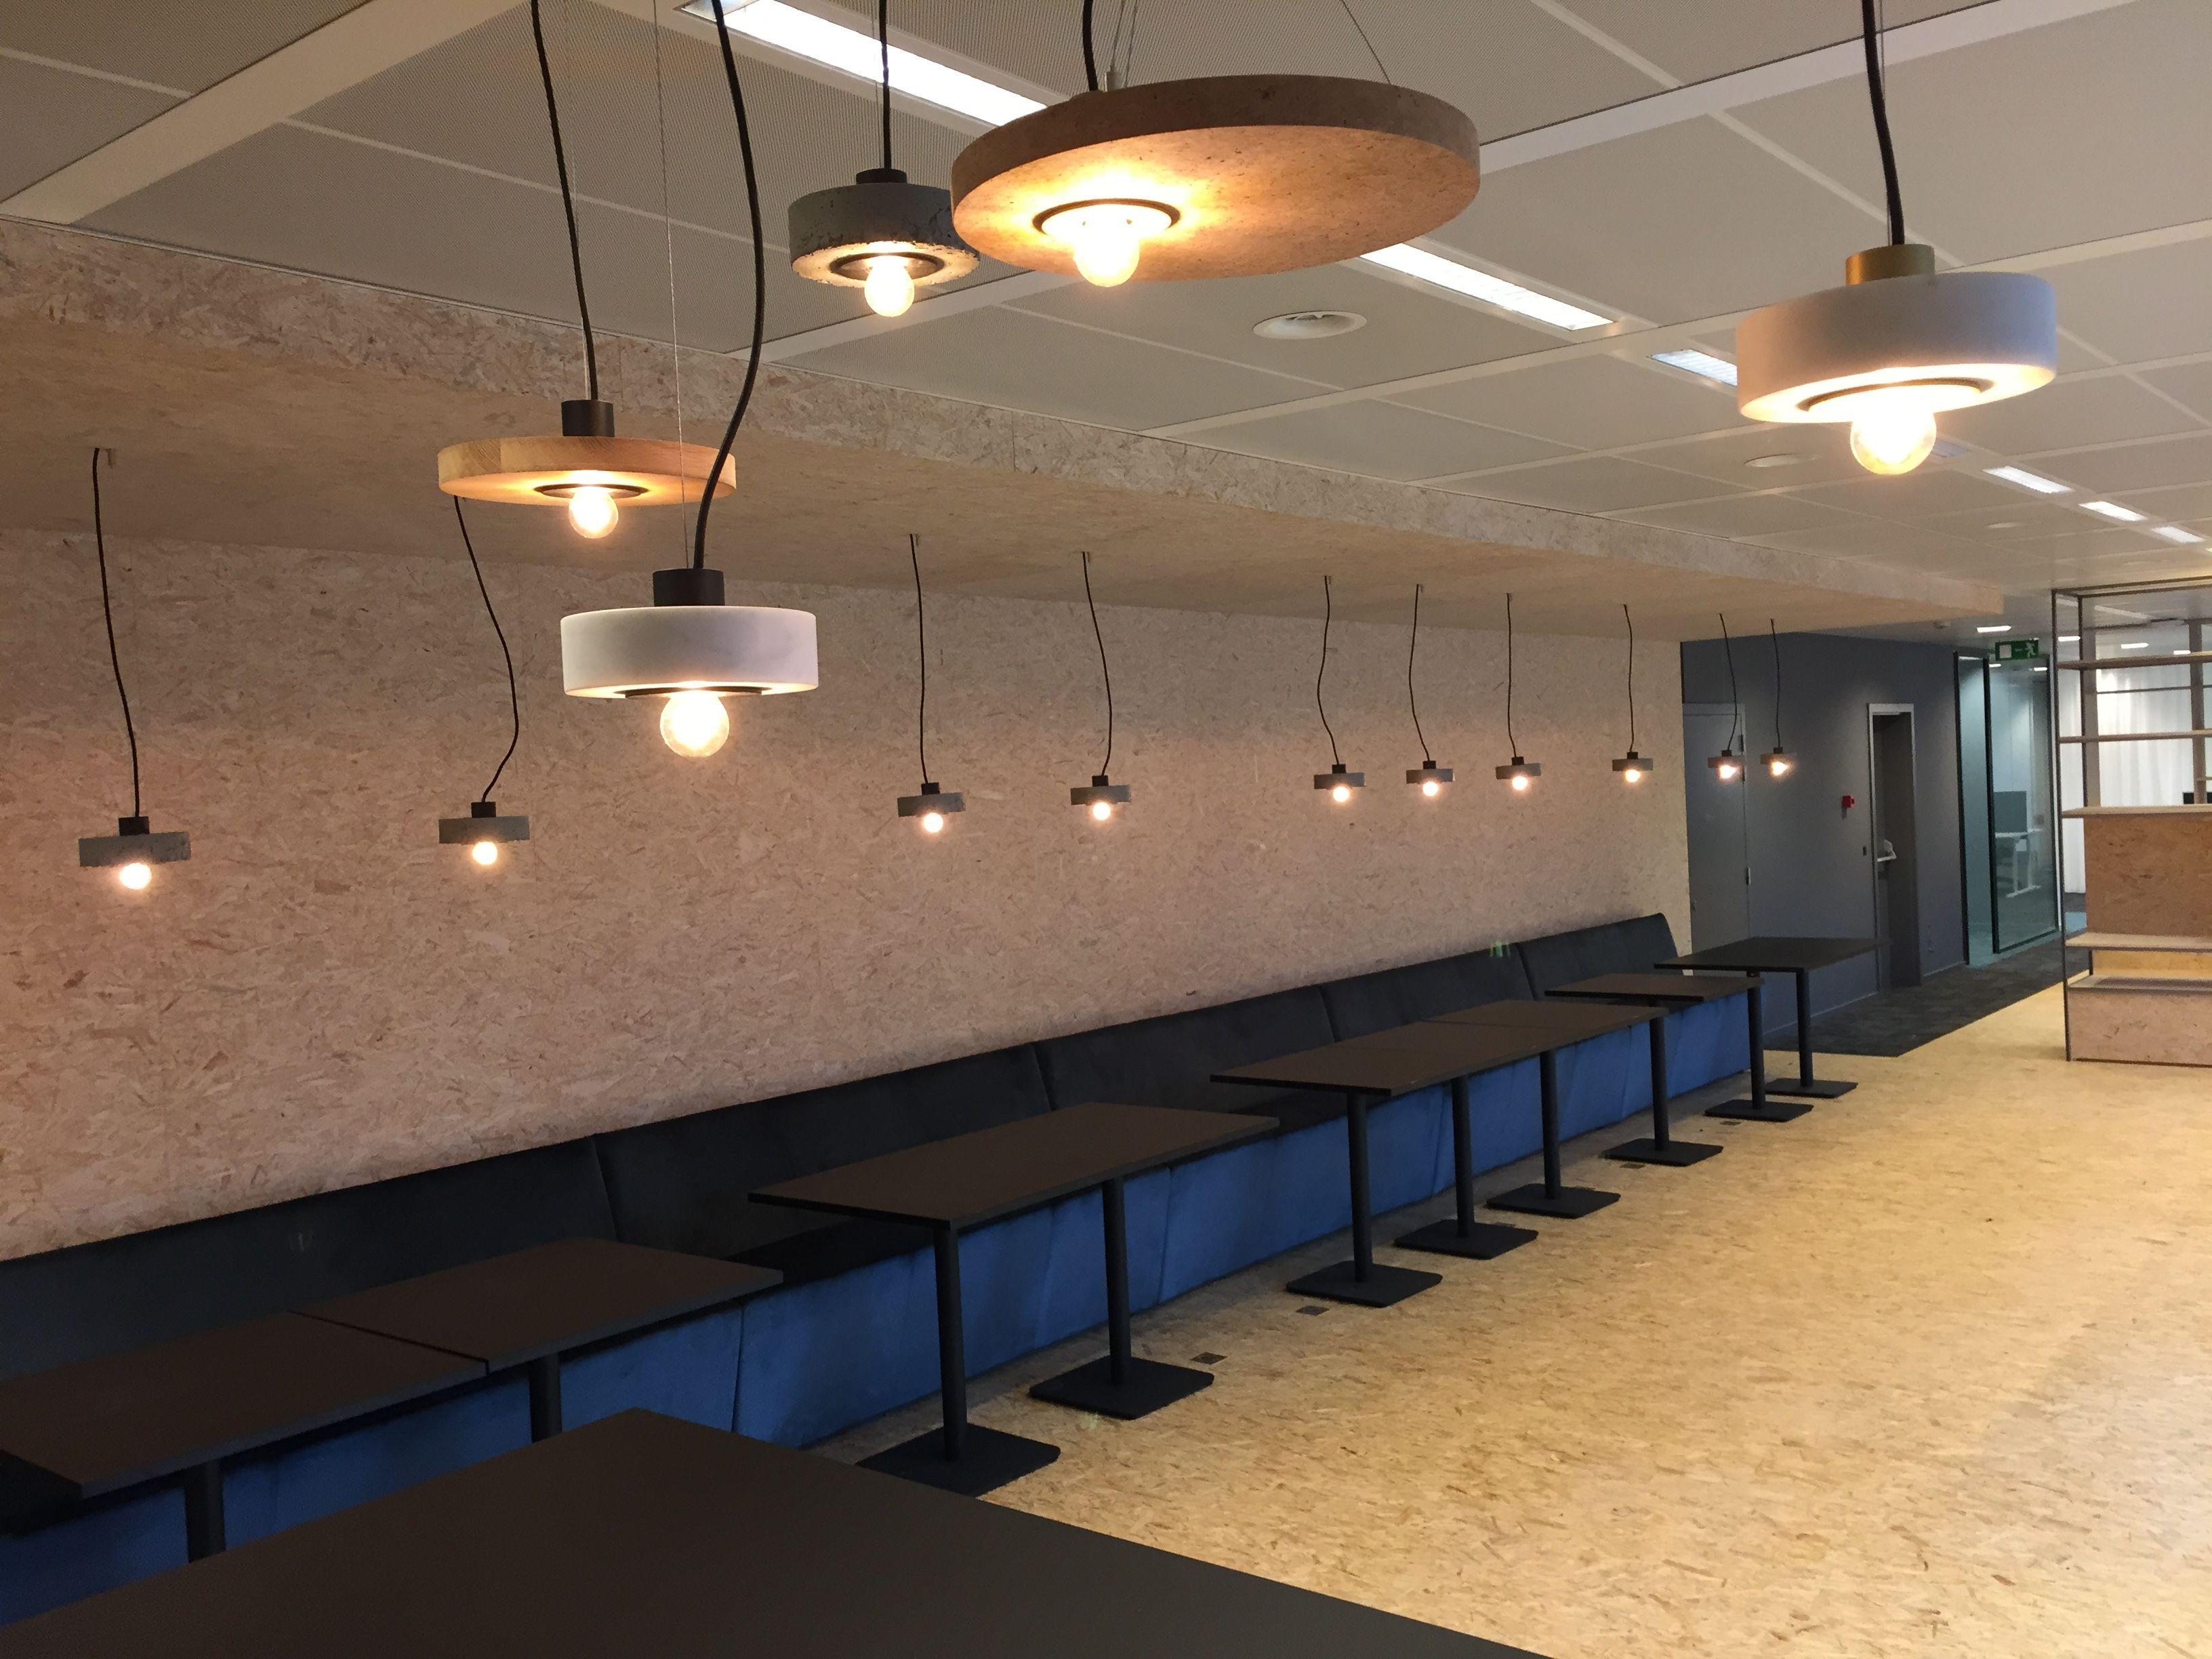 rond l dark lighting dark rondl codit office design rh pinterest com